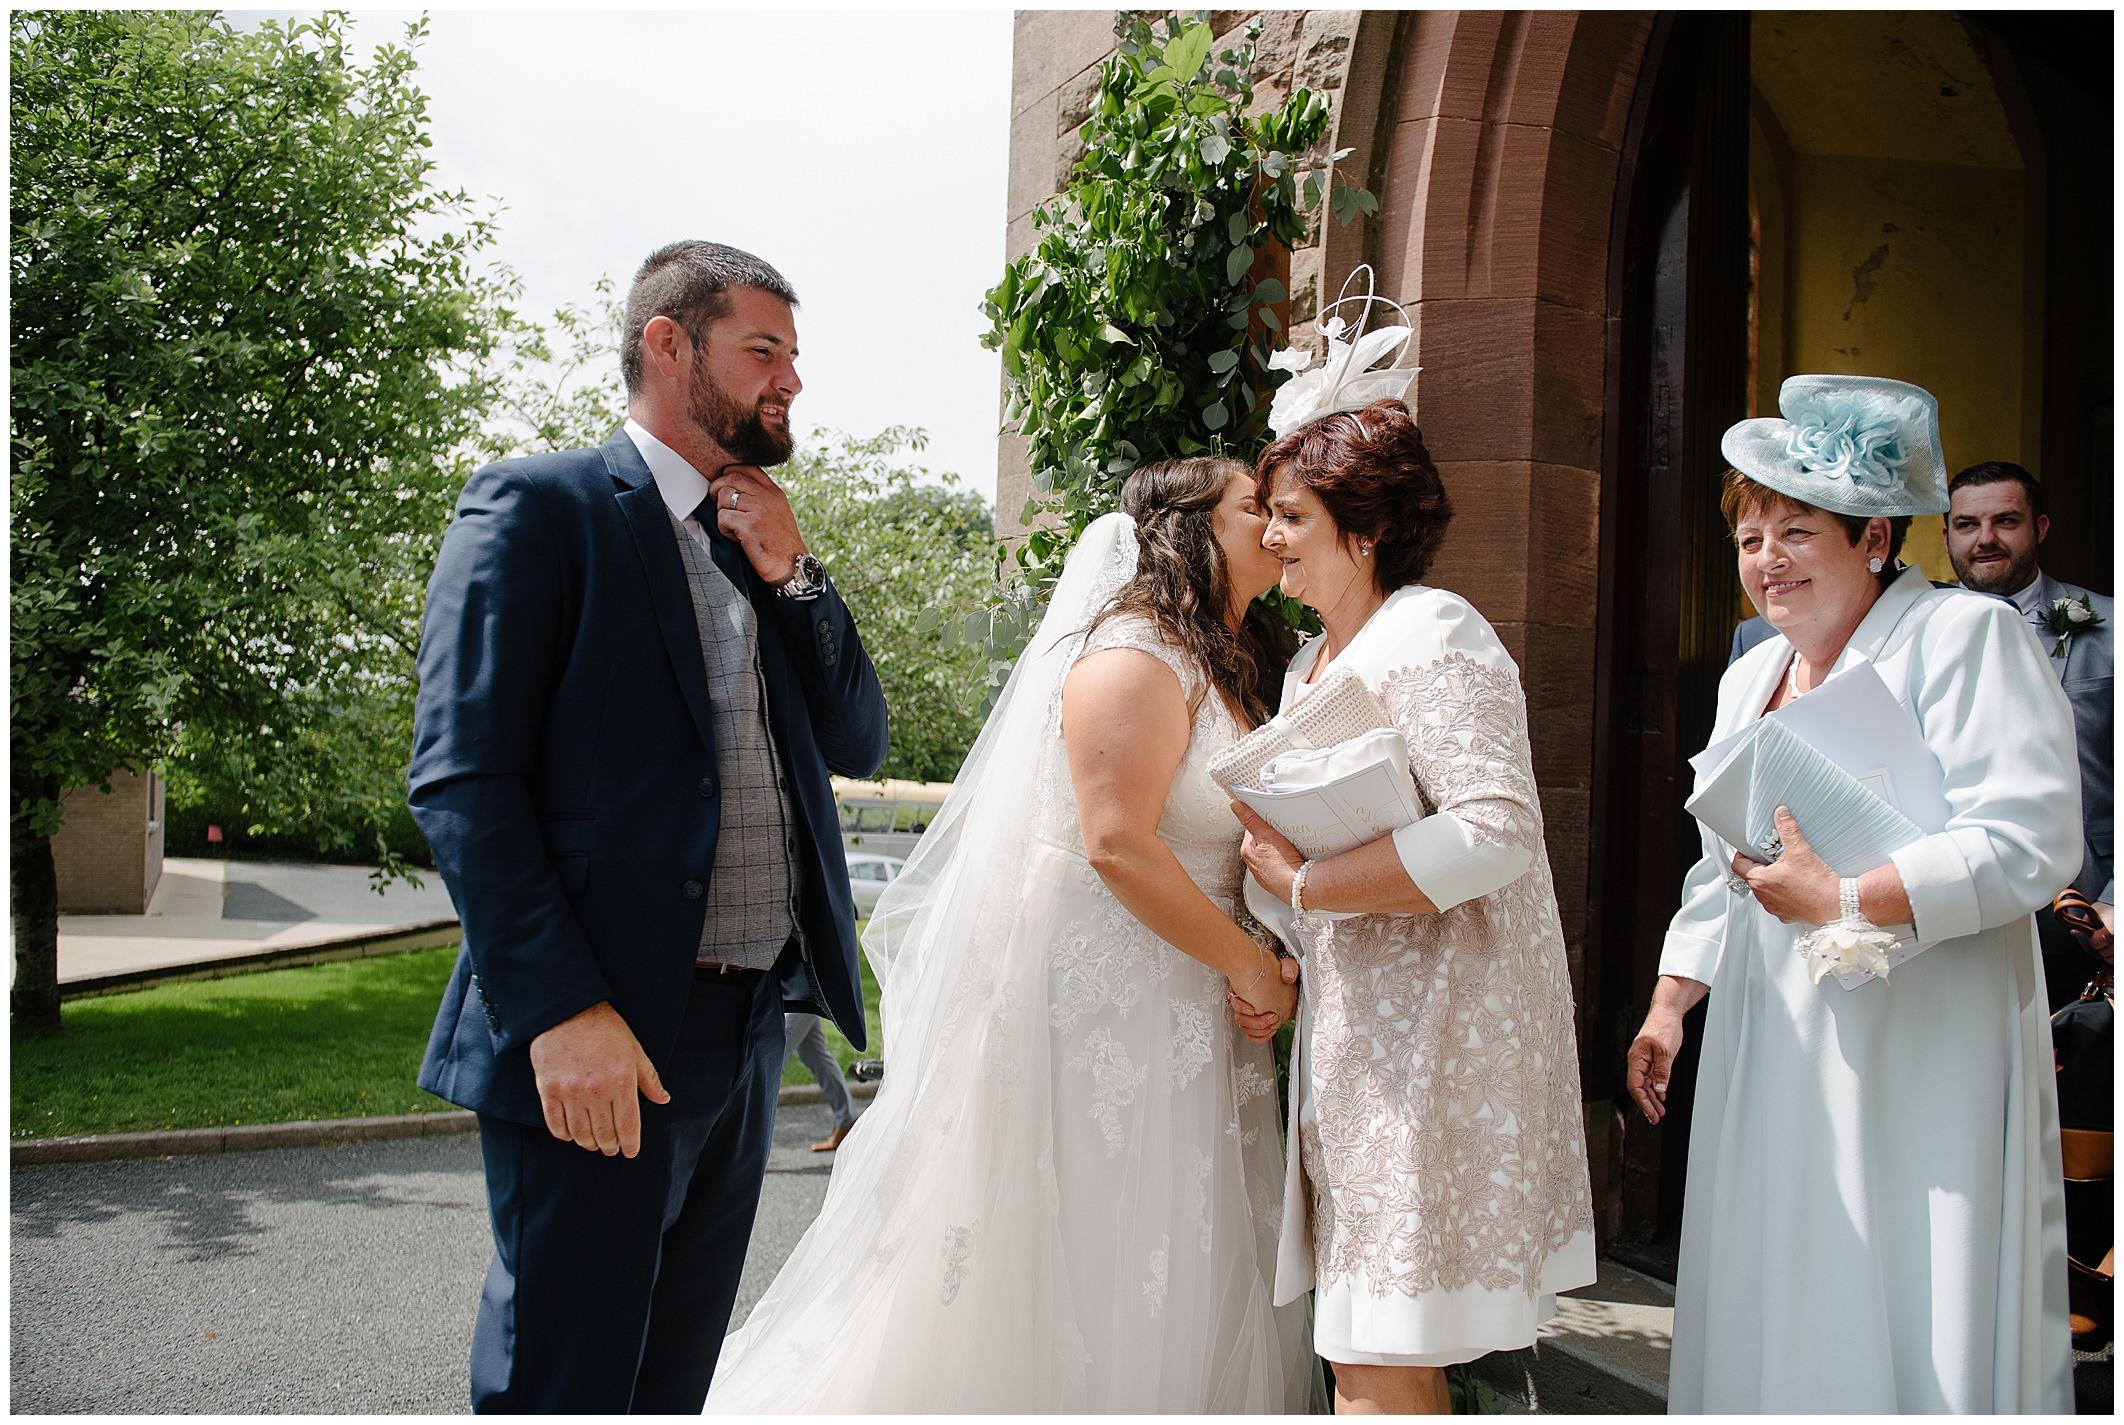 redcastle-hotel-wedding-karen-brian-jude-browne-photography-081.jpg